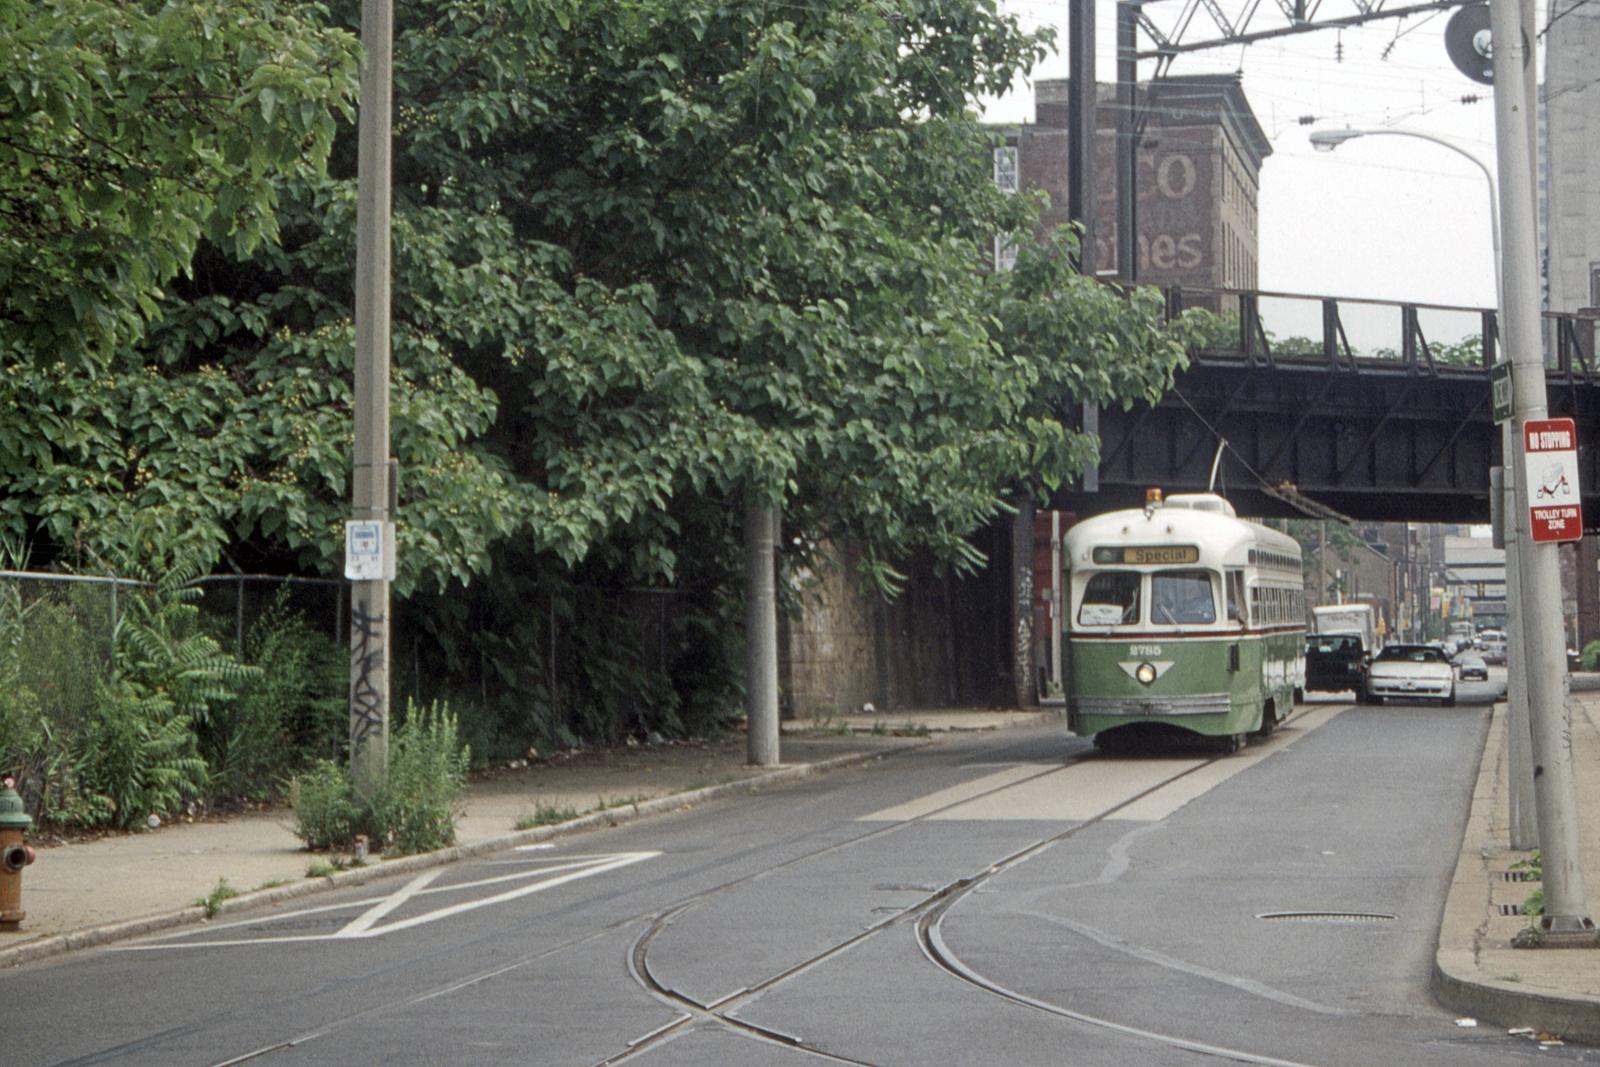 (844k, 1600x1067)<br><b>Country:</b> United States<br><b>City:</b> Philadelphia, PA<br><b>System:</b> SEPTA (or Predecessor)<br><b>Line:</b> Rt. 23-Germantown<br><b>Location:</b> 11th/Noble<br><b>Car:</b> PTC/SEPTA Postwar All-electric PCC (St.Louis, 1947) 2785 <br><b>Collection of:</b> David Pirmann<br><b>Date:</b> 7/1/1995<br><b>Viewed (this week/total):</b> 0 / 68